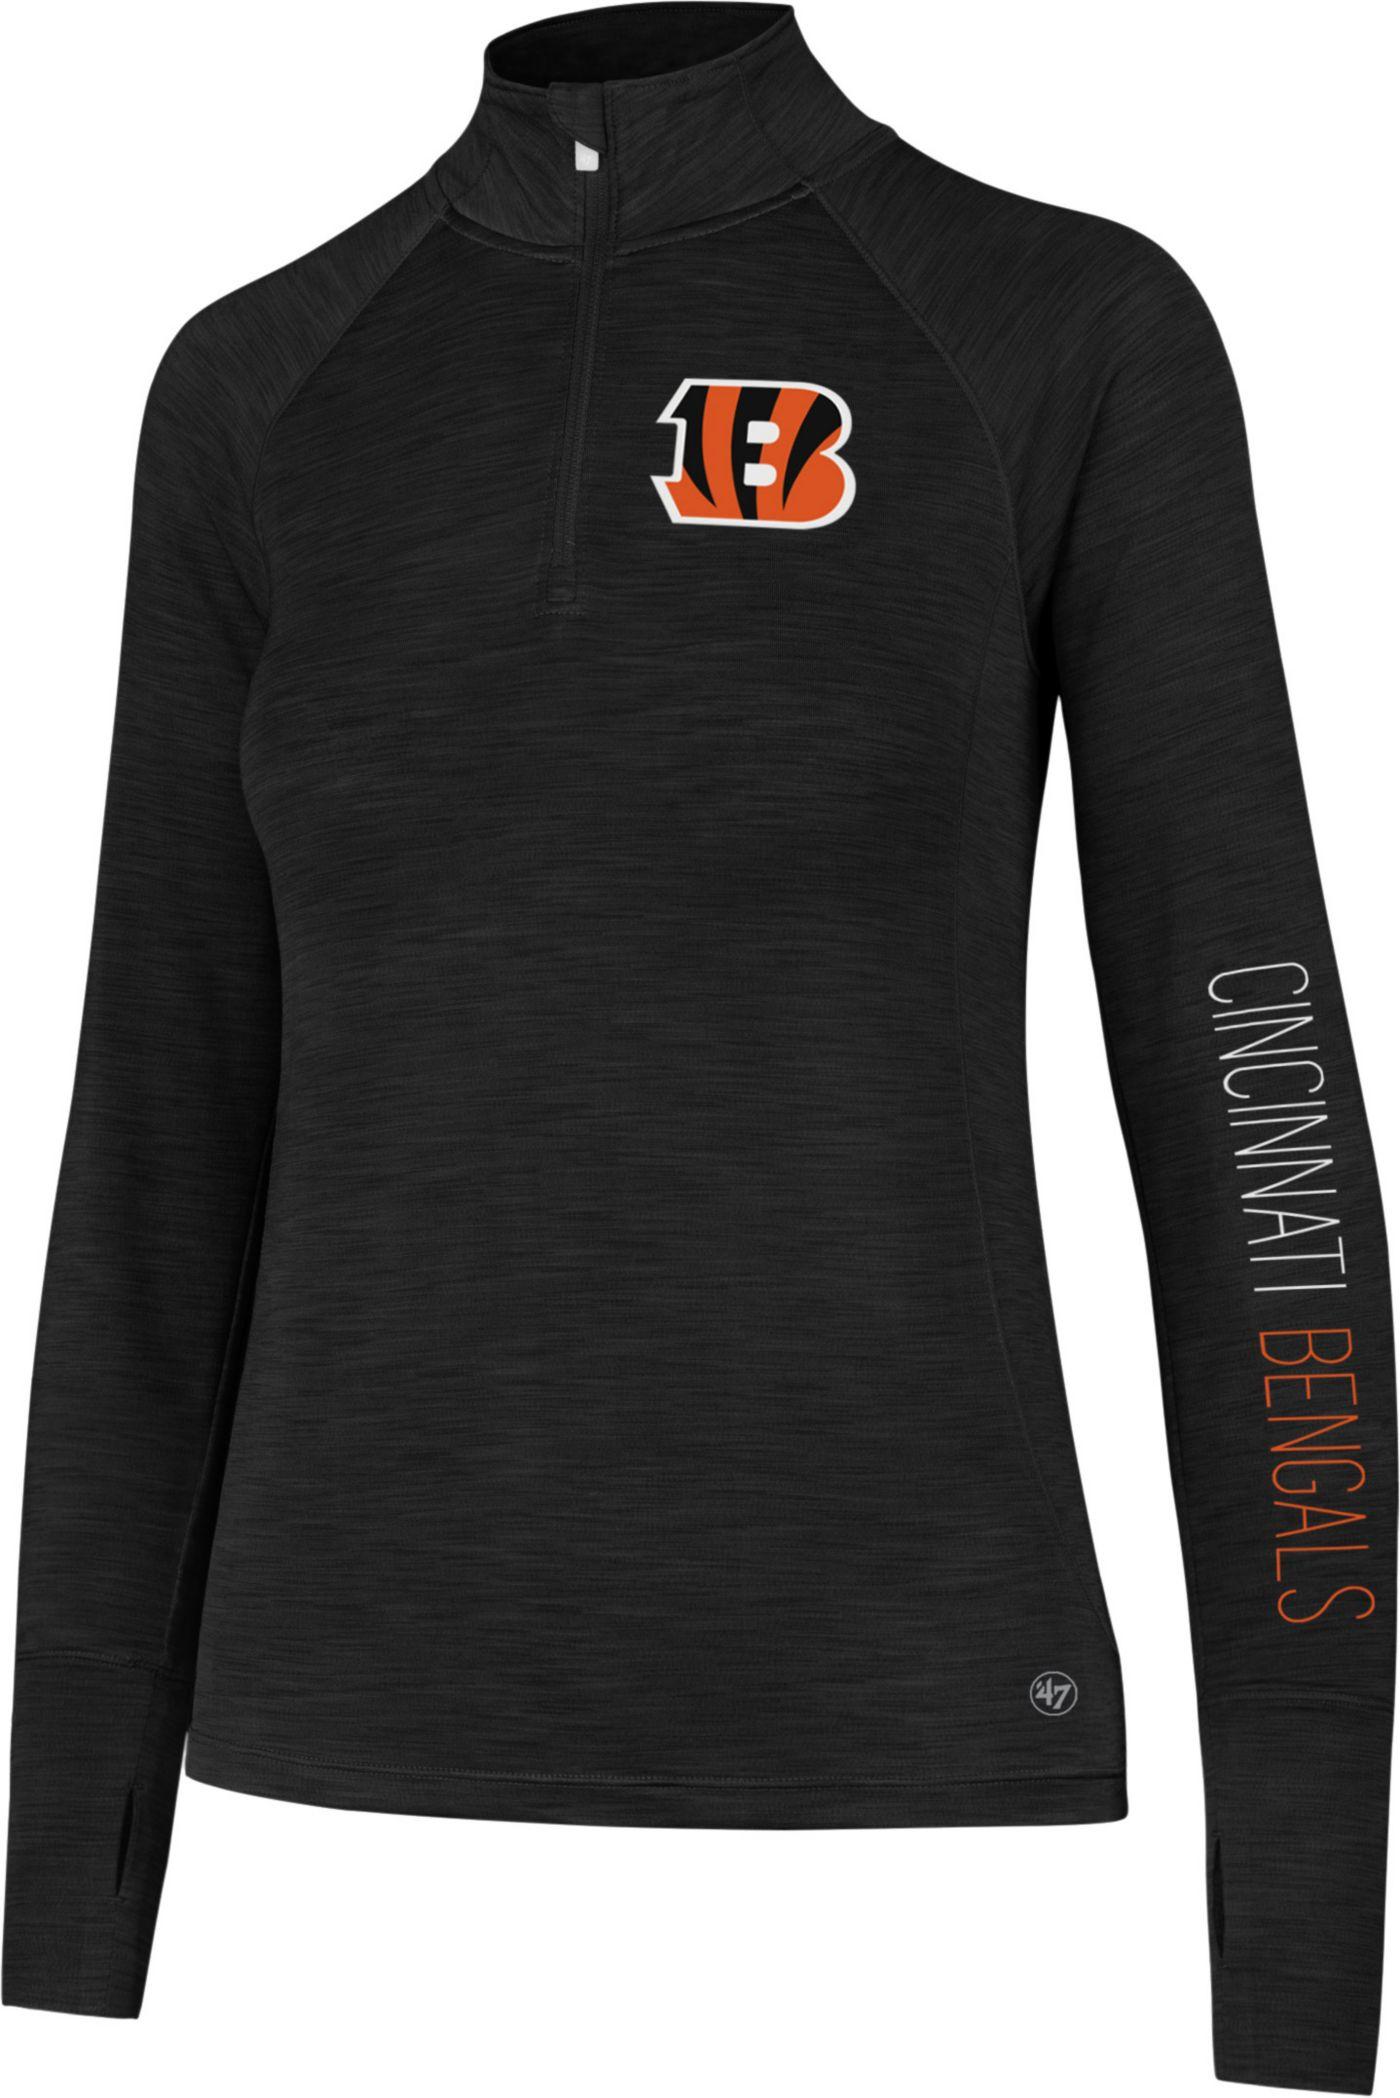 '47 Women's Cincinnati Bengals Shade Black Quarter-Zip Pullover